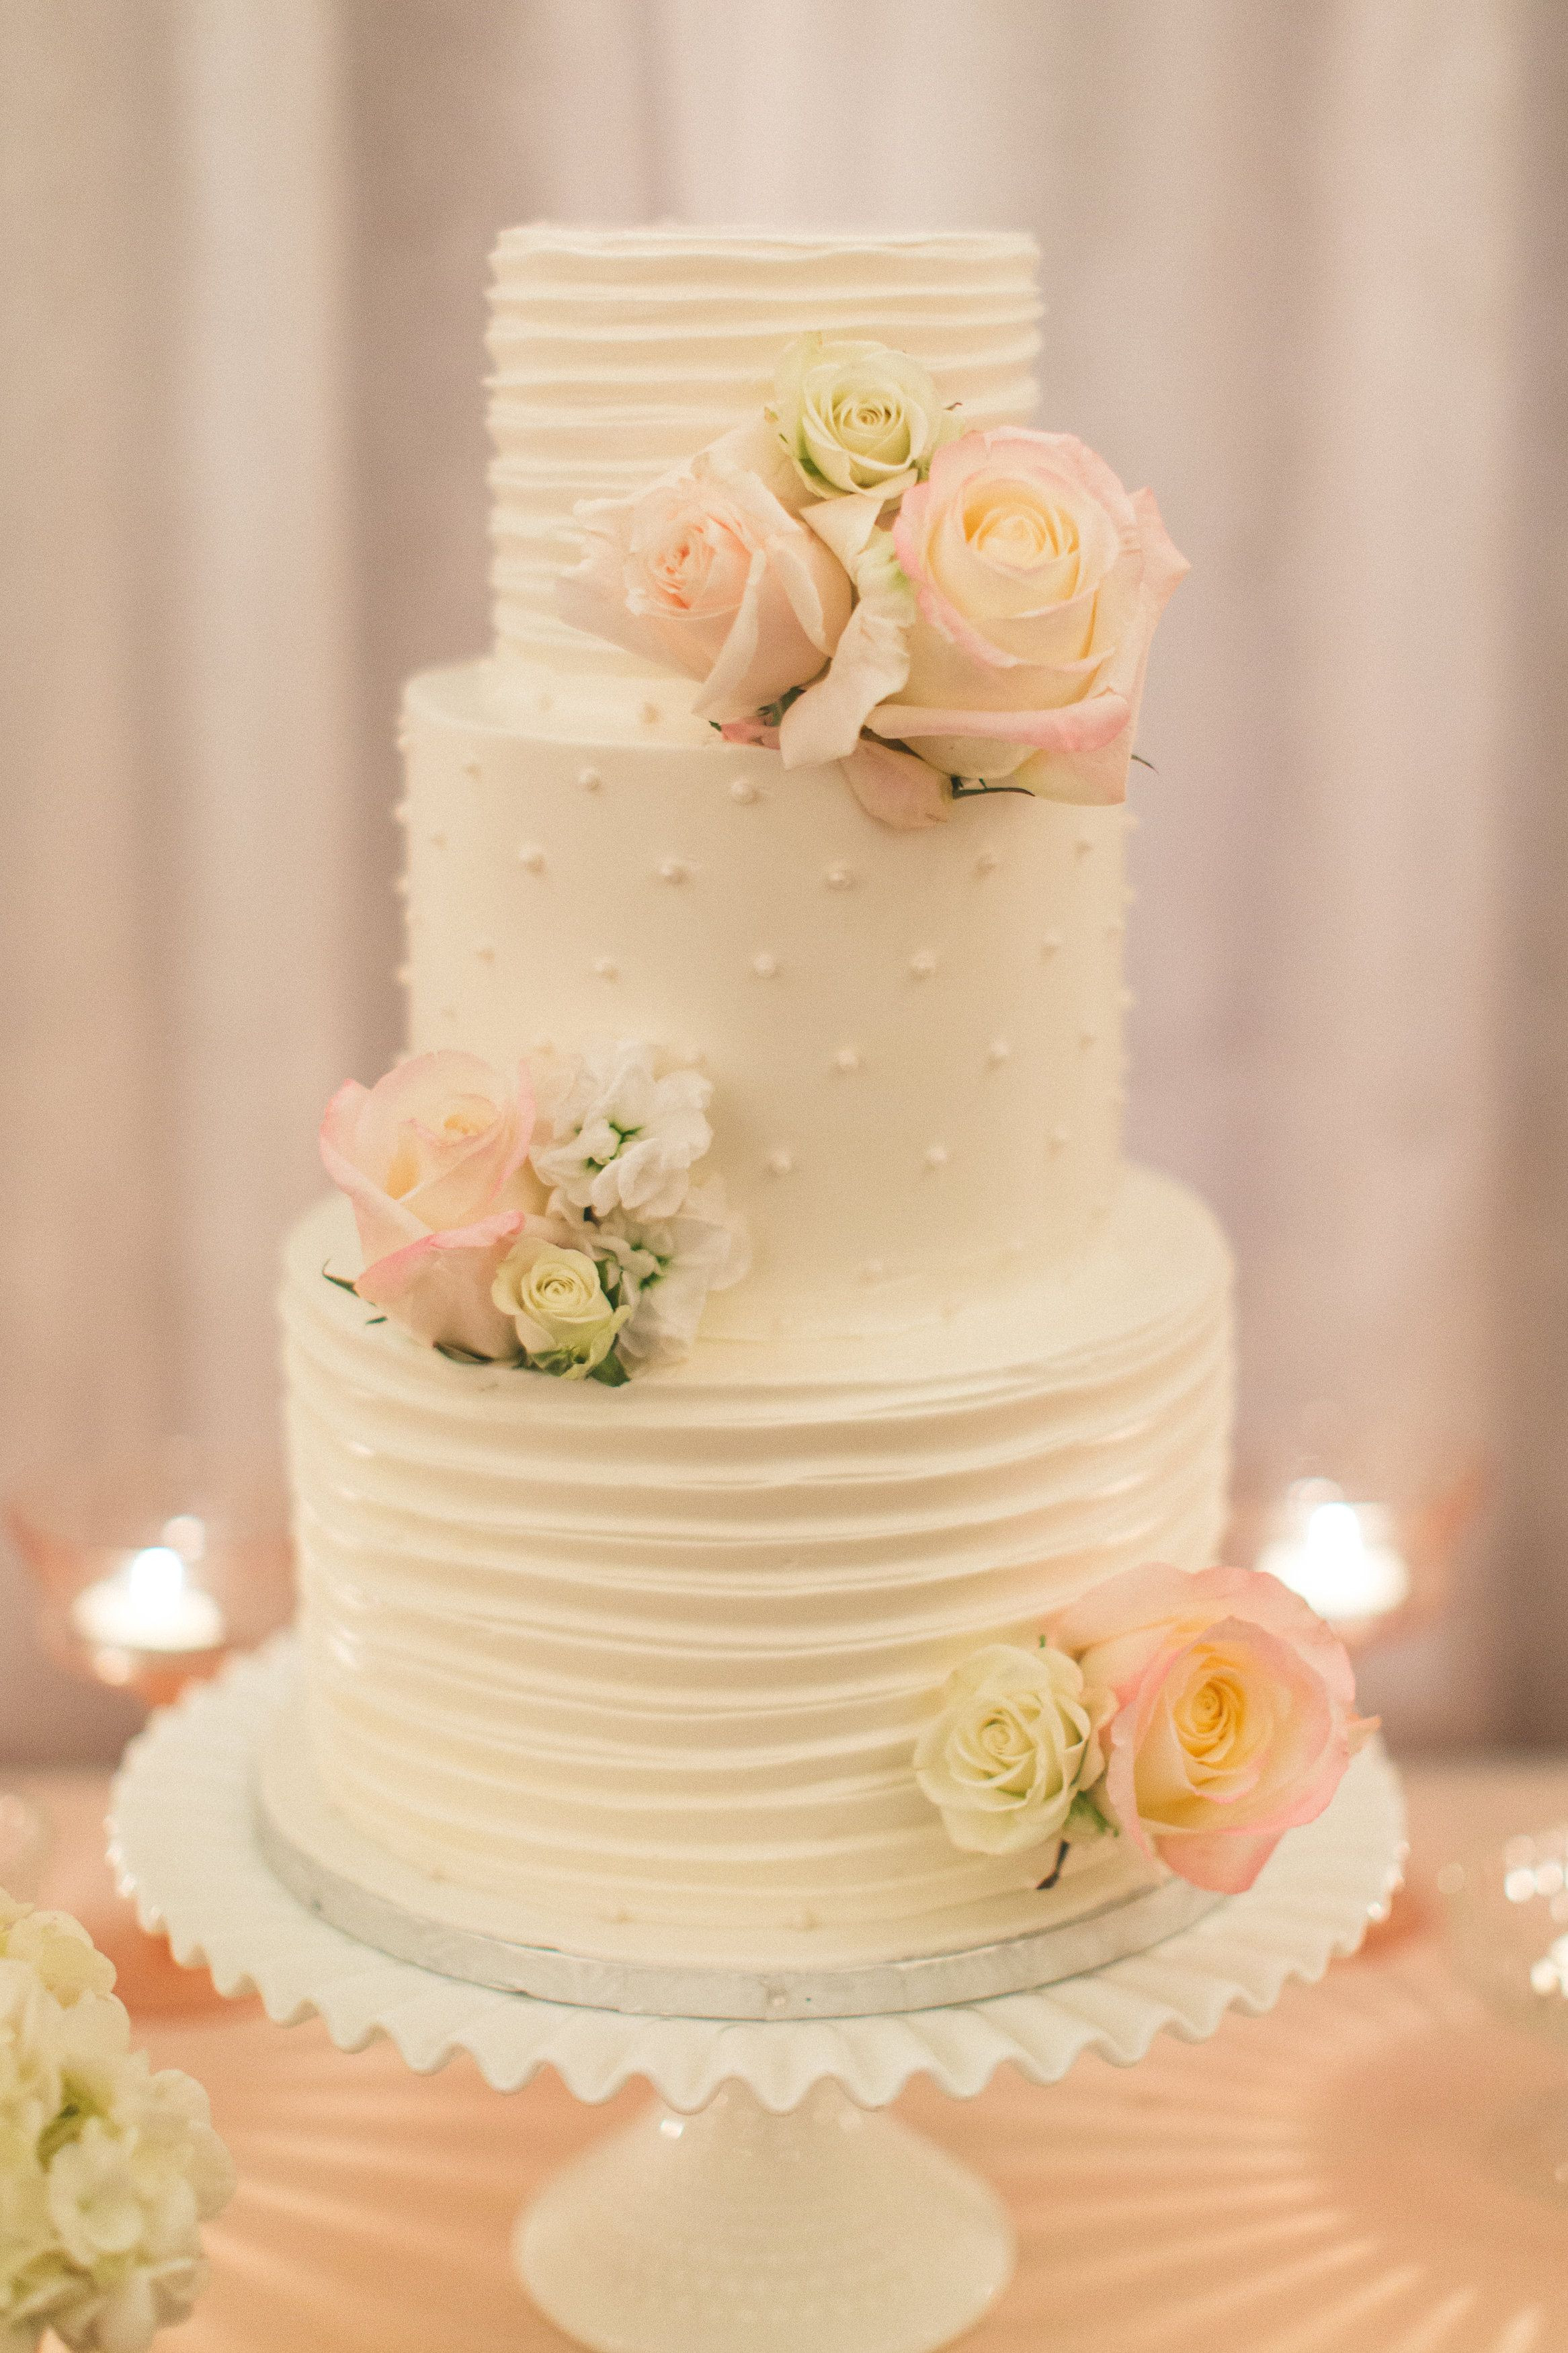 Simple Wedding Cakes Pinterest  Best 25 Wedding cake fresh flowers ideas on Pinterest